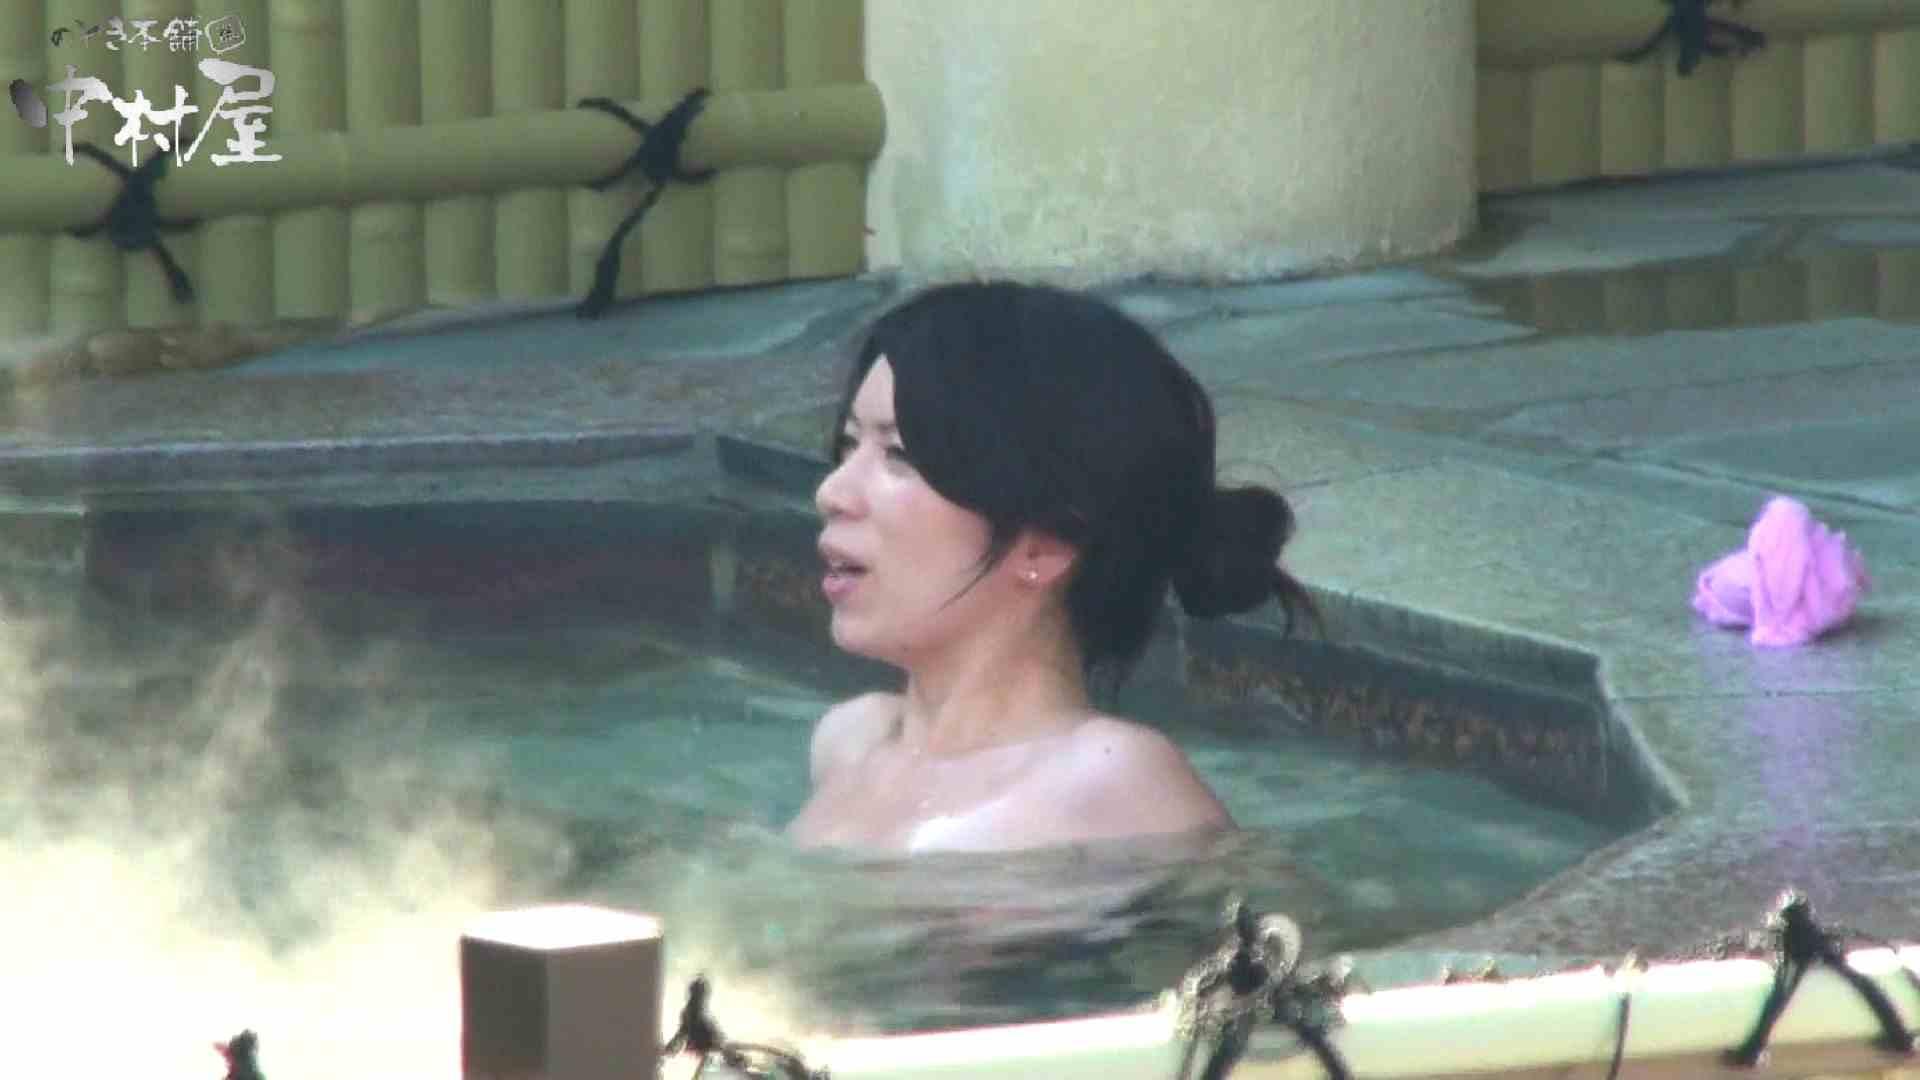 Aquaな露天風呂Vol.919 盗撮 おまんこ無修正動画無料 91連発 32